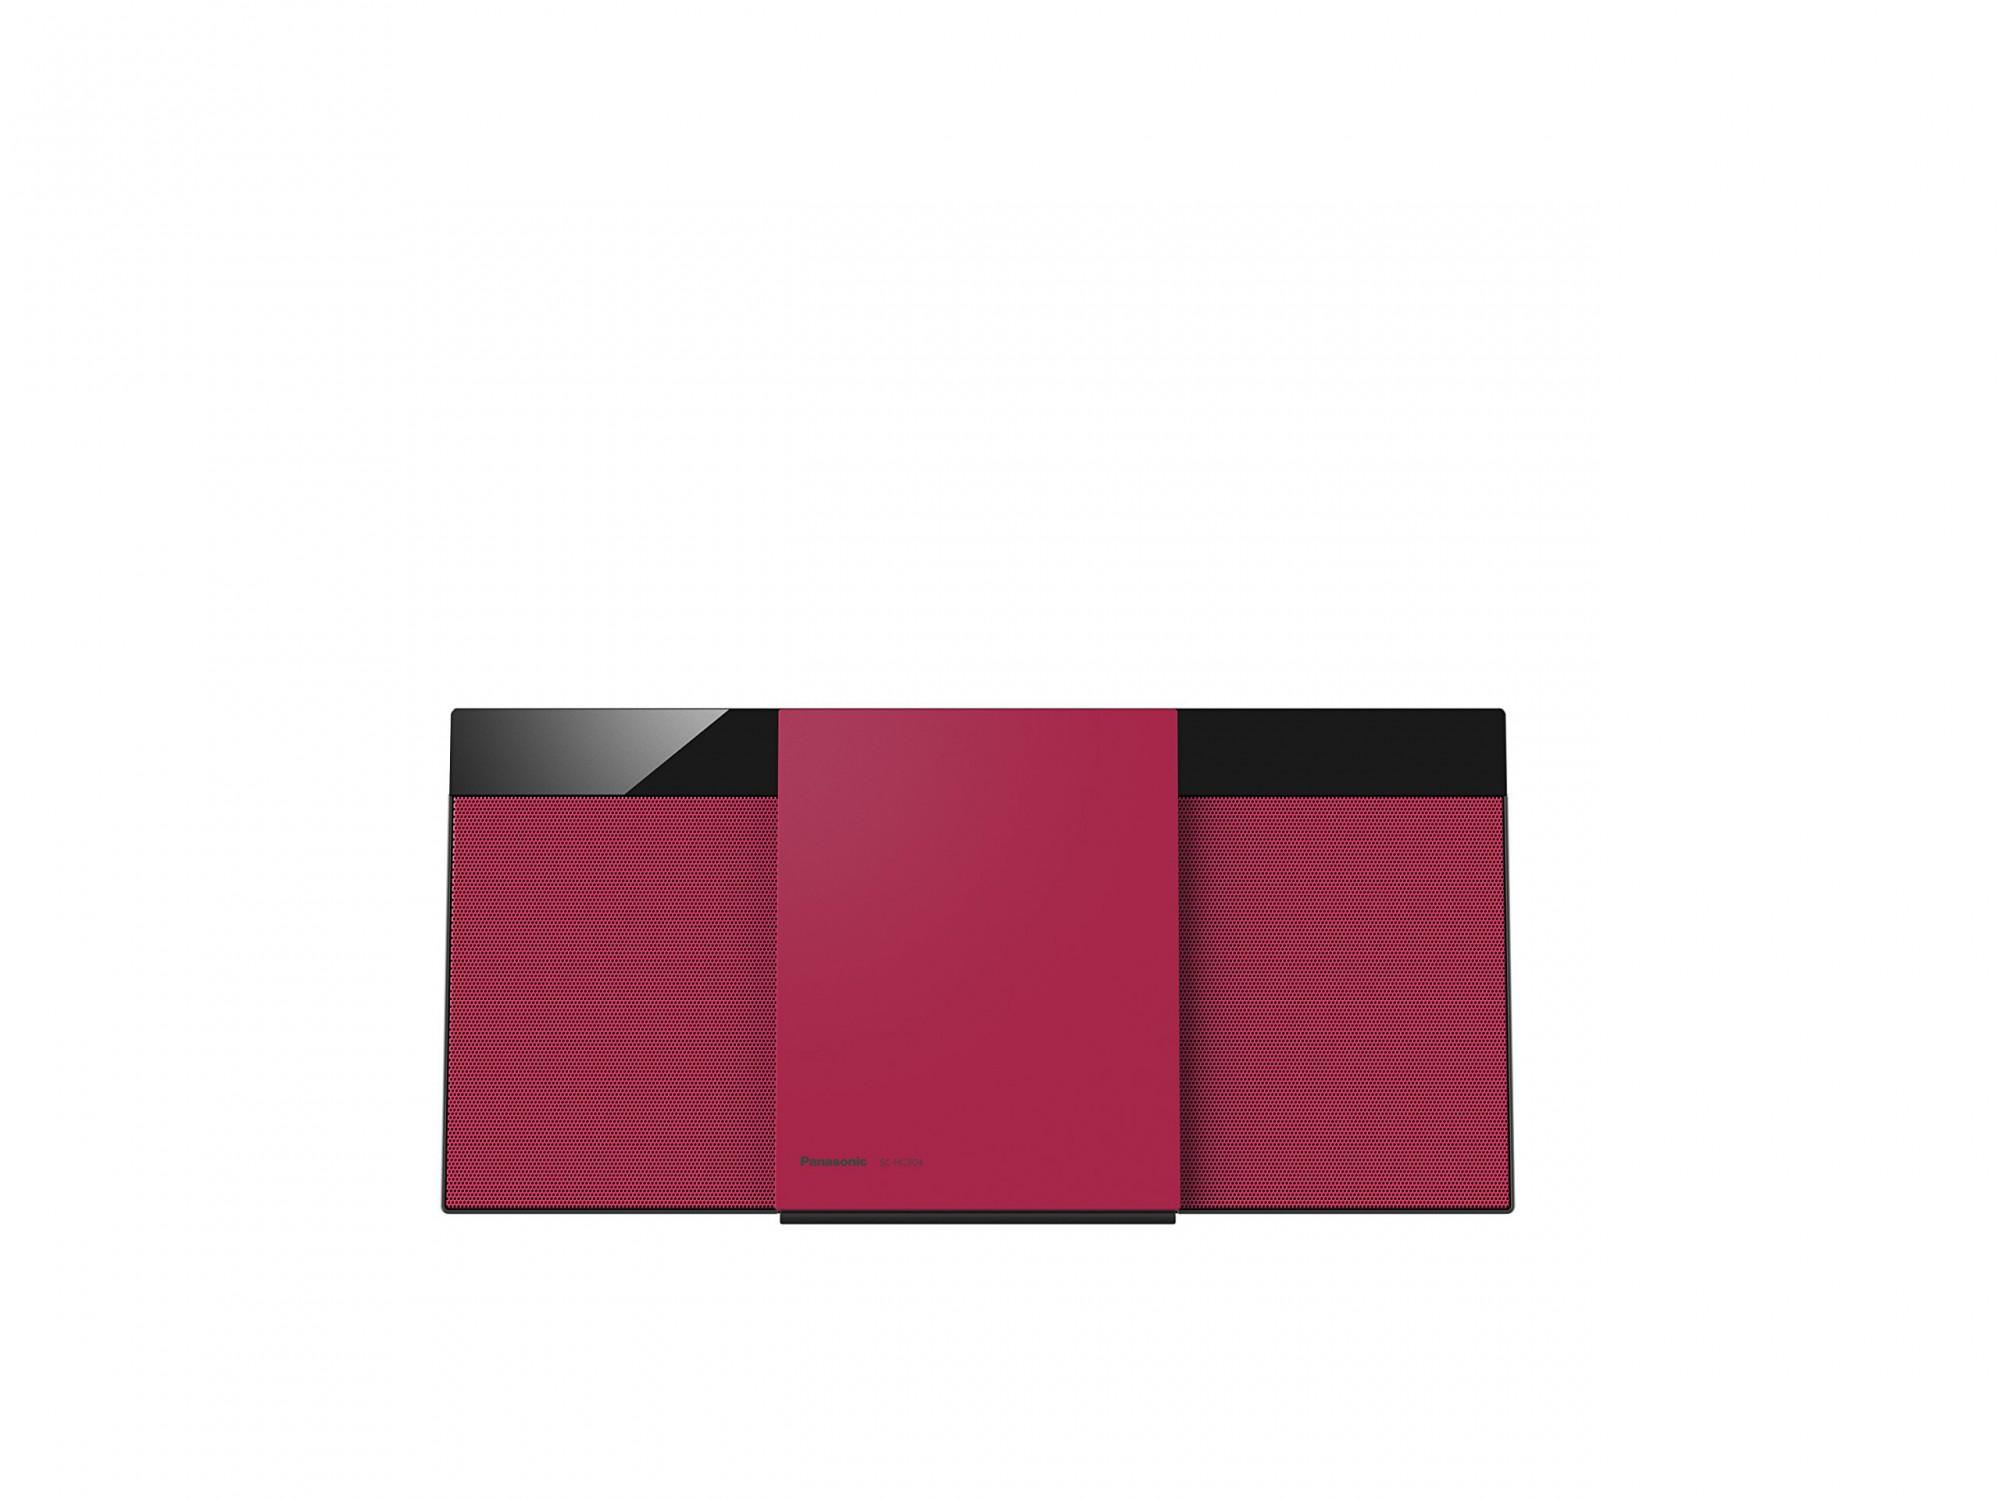 Panasonic Micro HiFi System SC-HC304EG-R #rot